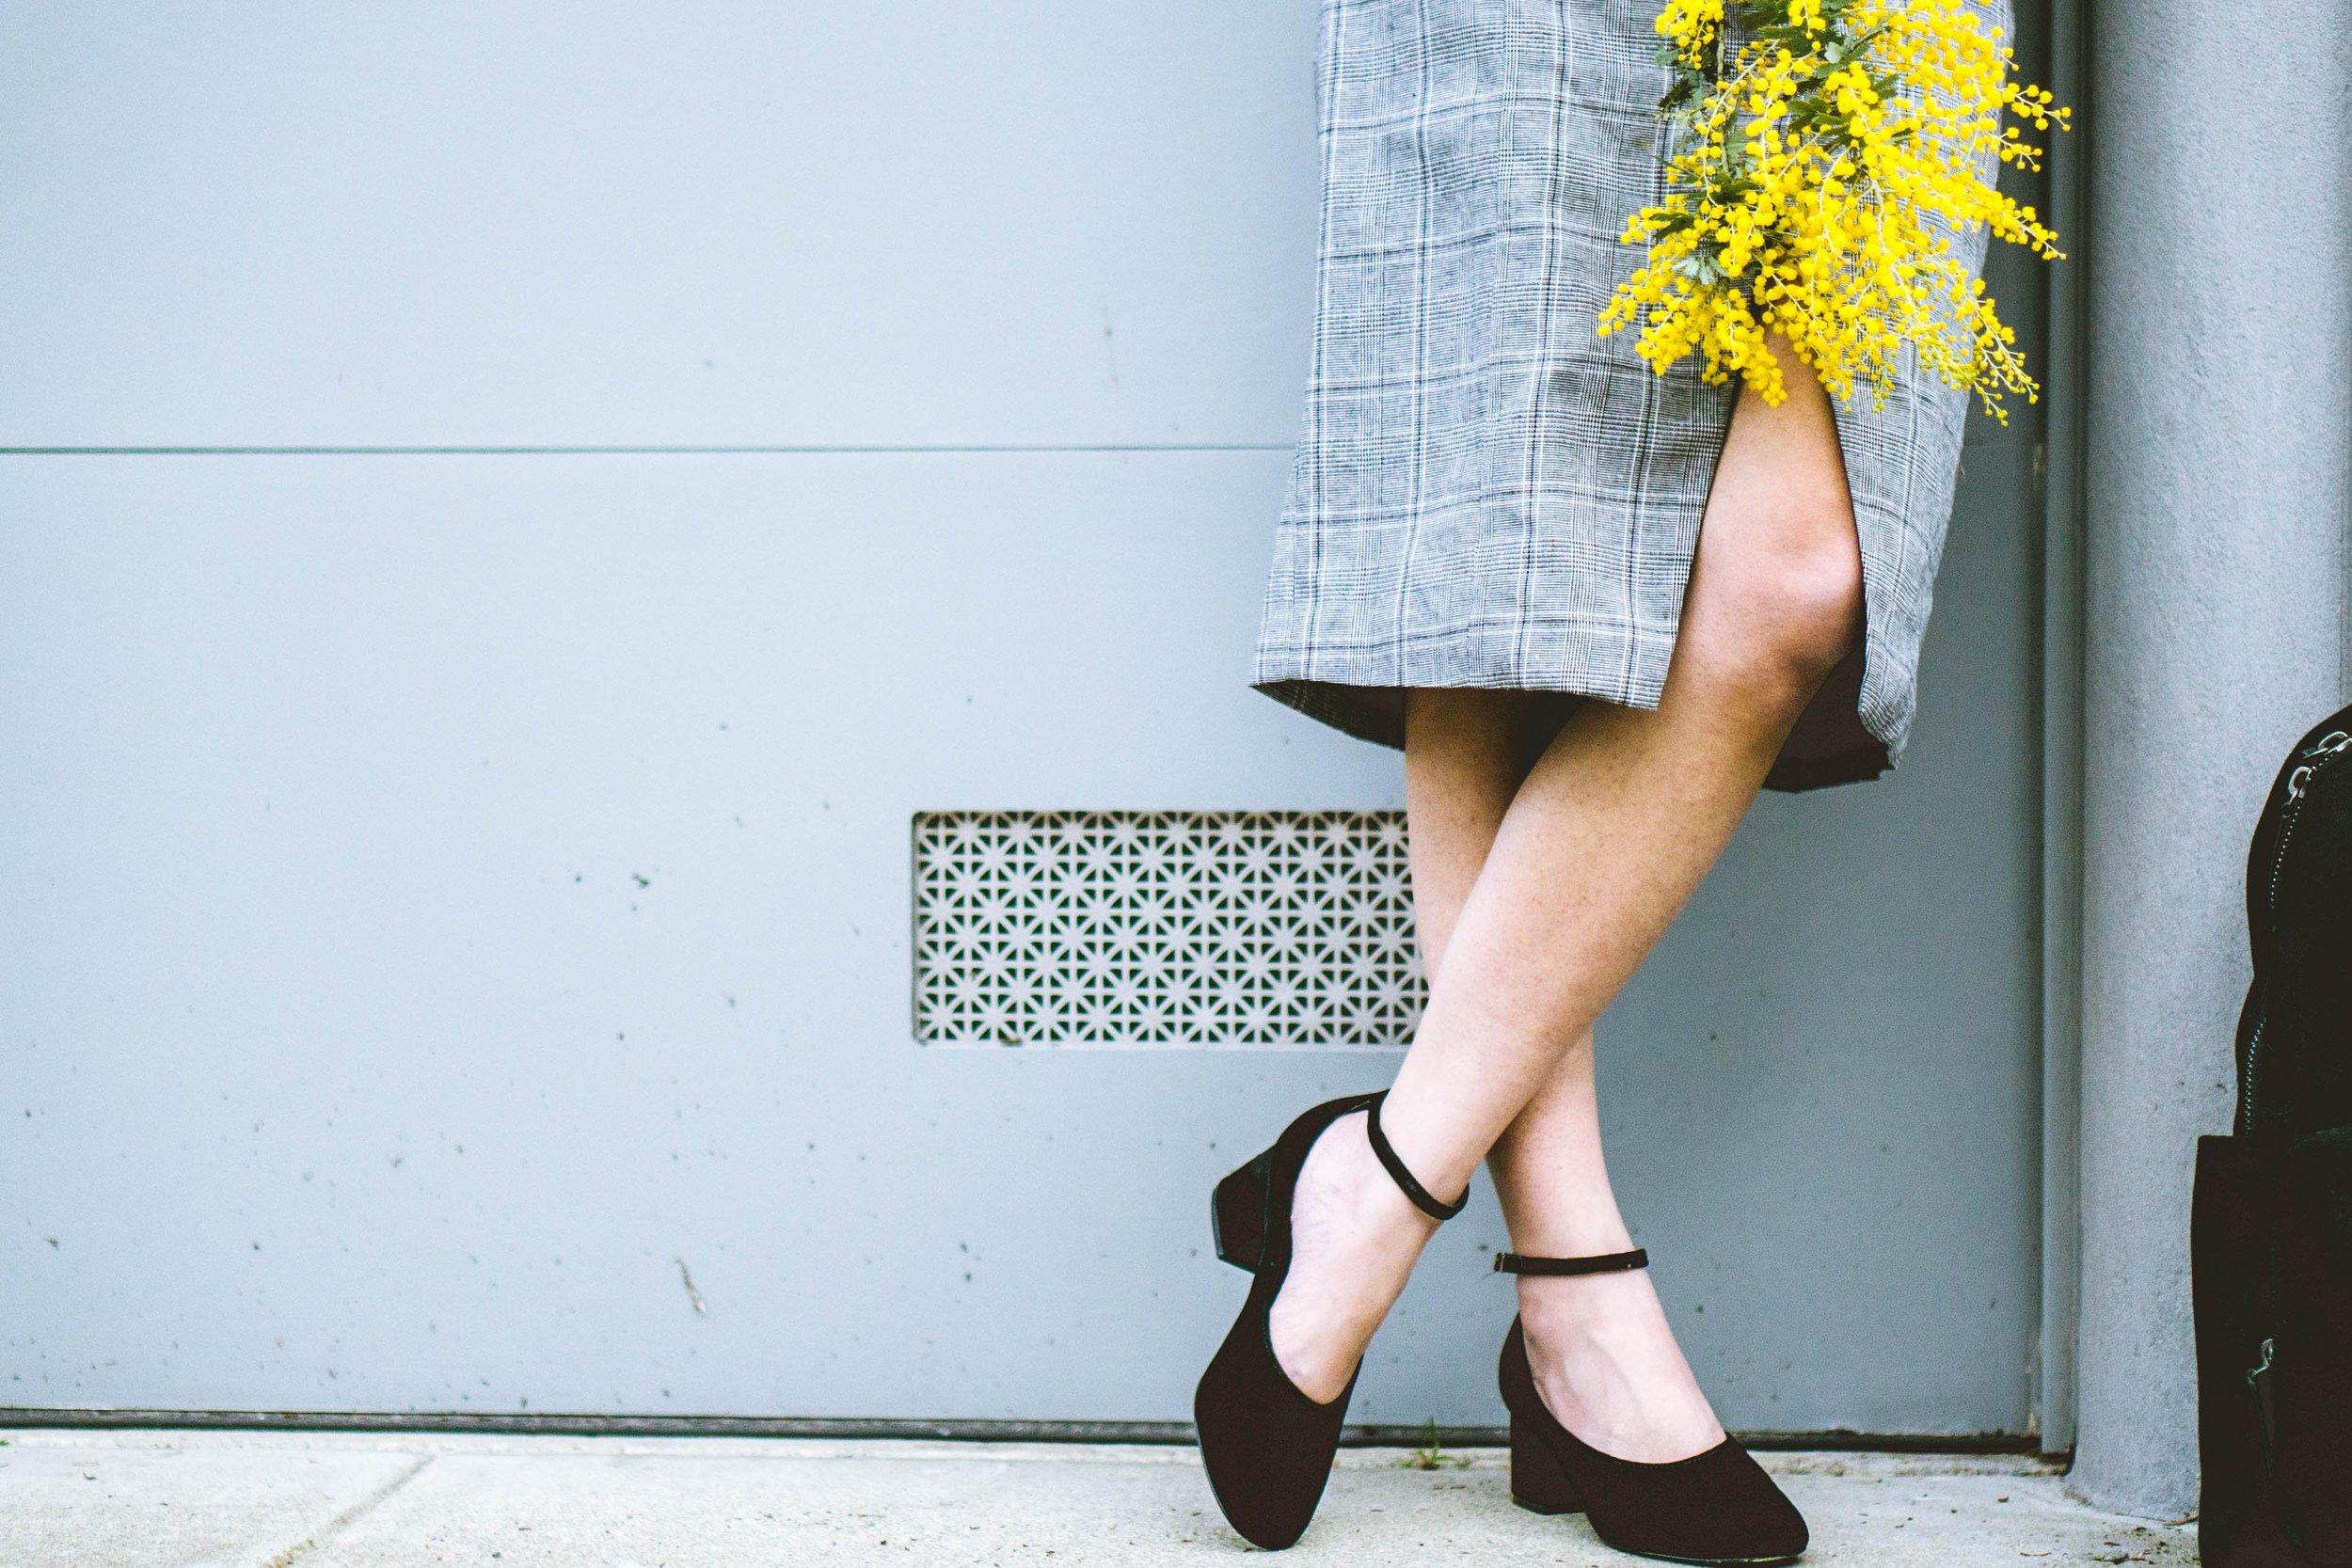 Dress: Eggie, Sheer top: STYLEADDICT, Mary Jane heels: Sigerson Morrison, Backpack: Everlane